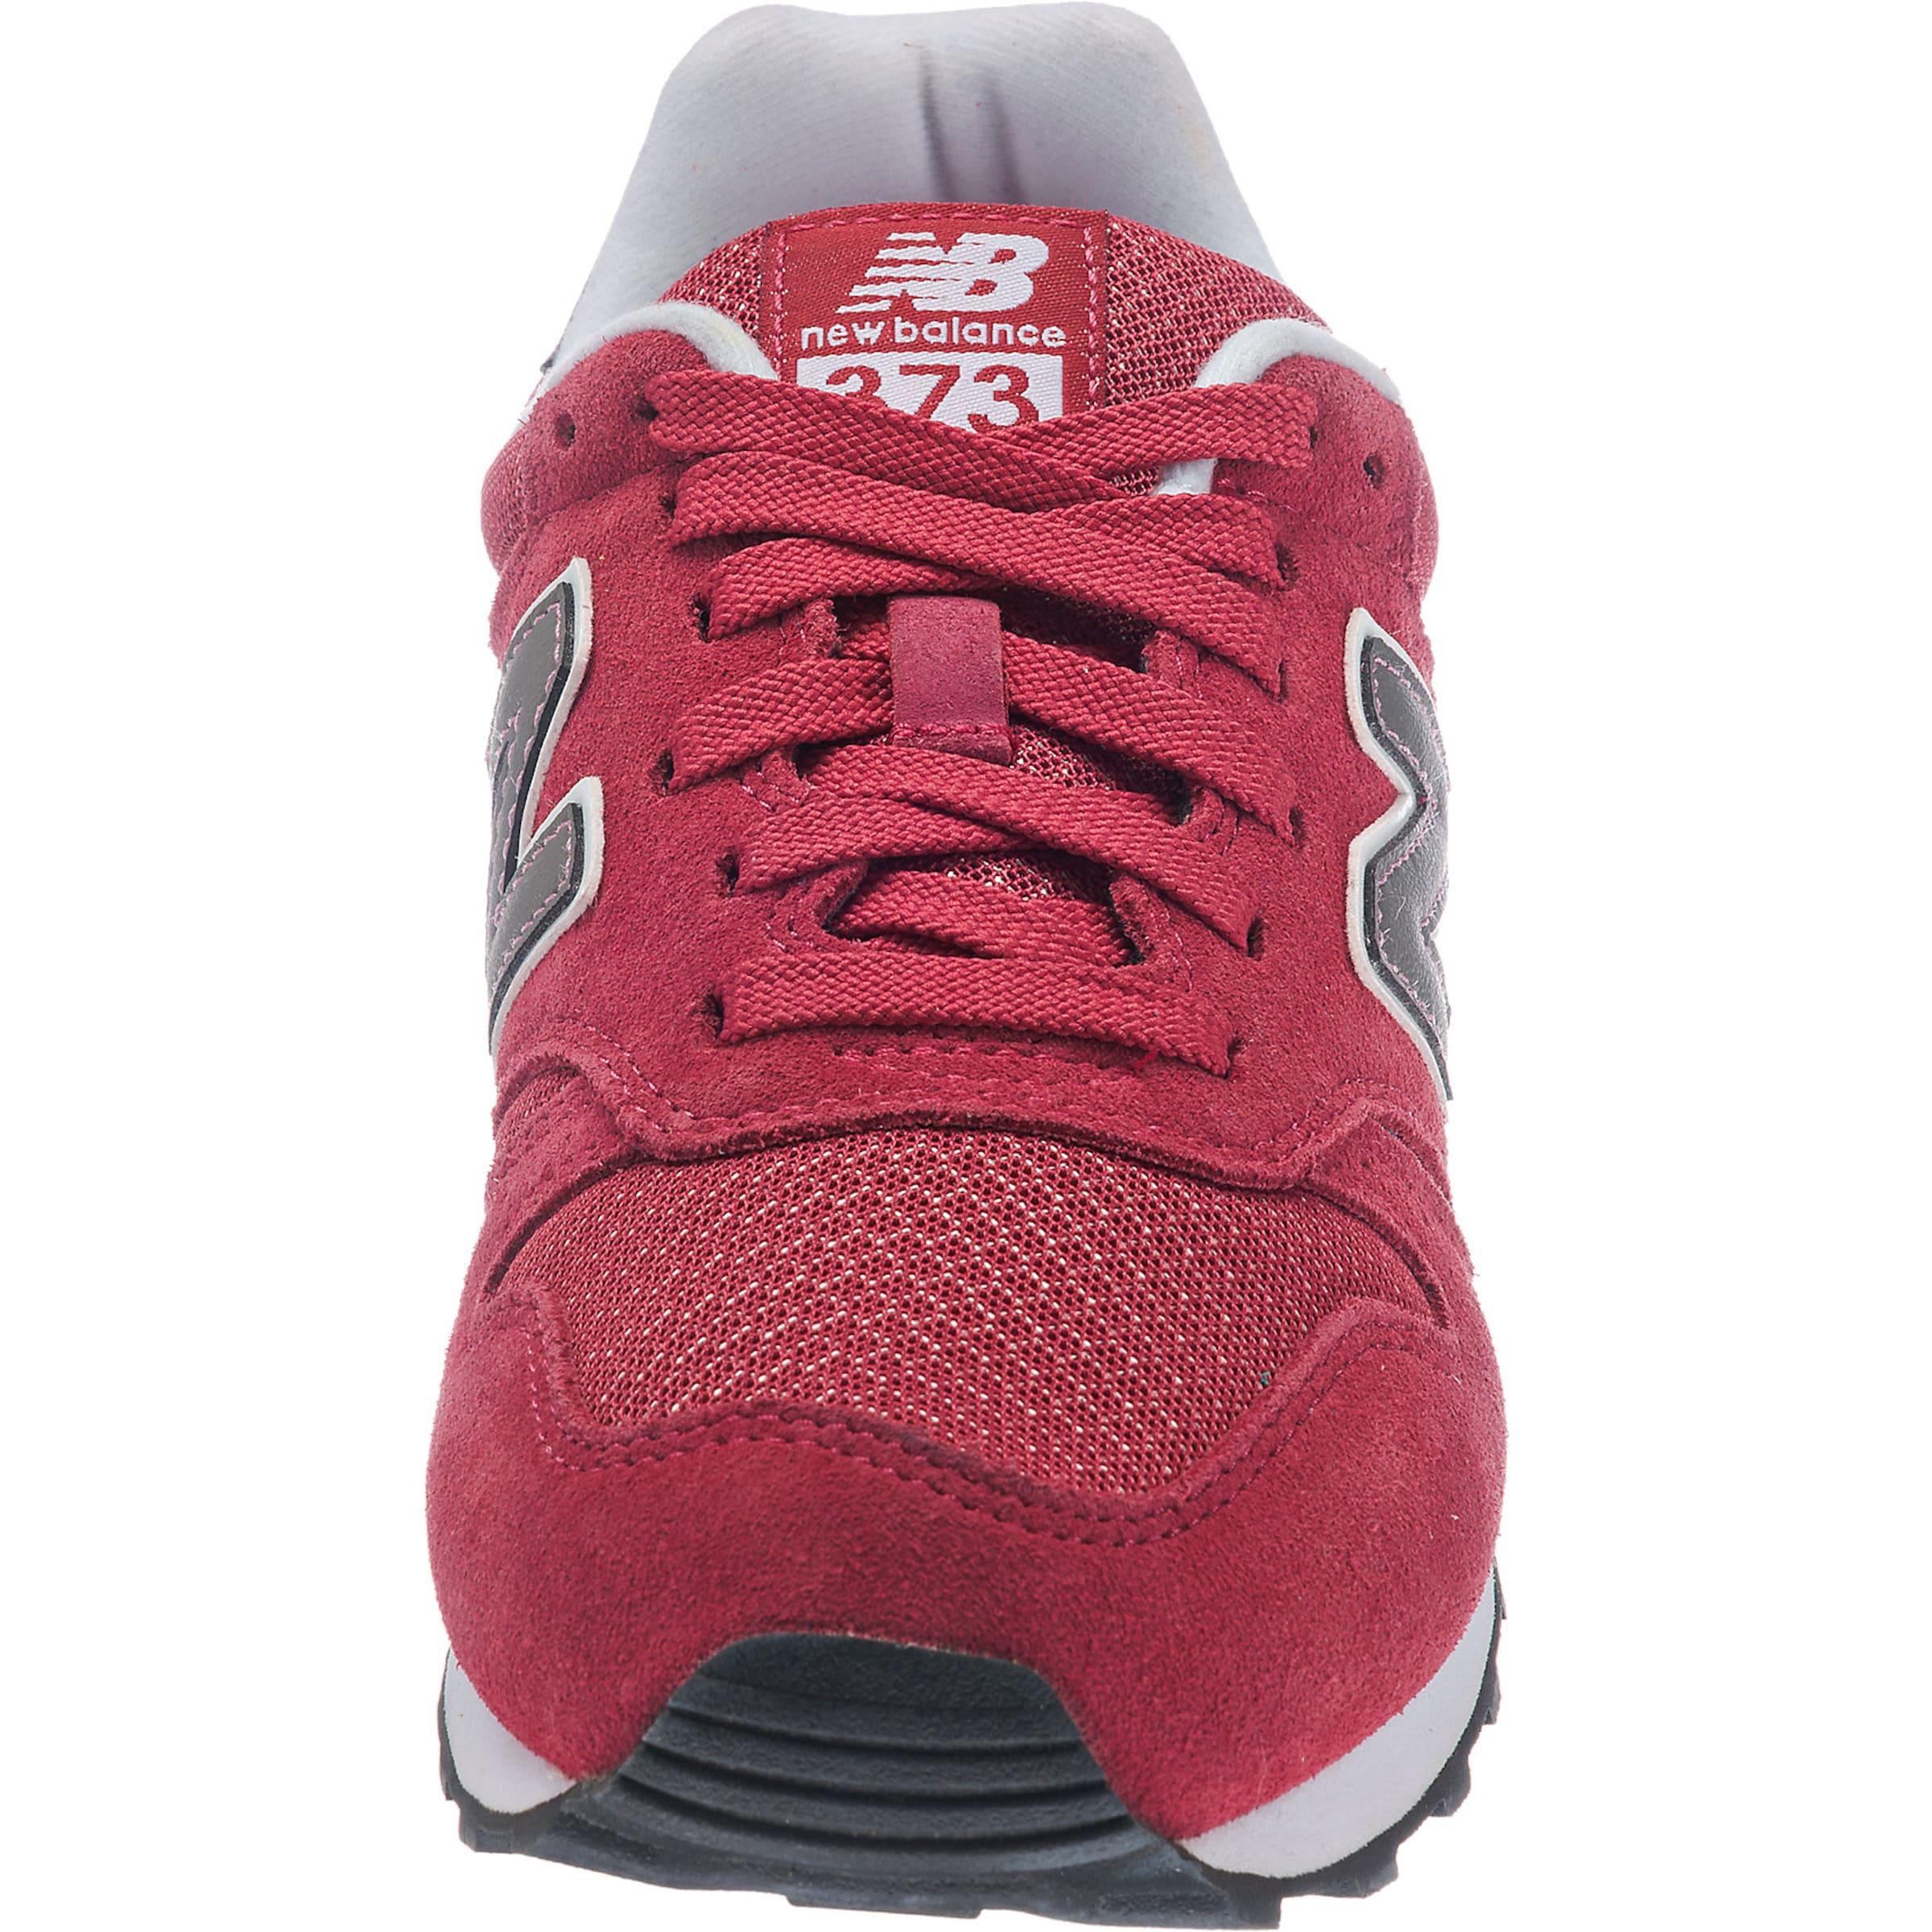 new balance Sneakers 'WL373 B' Rabatt Manchester oDXvDk95